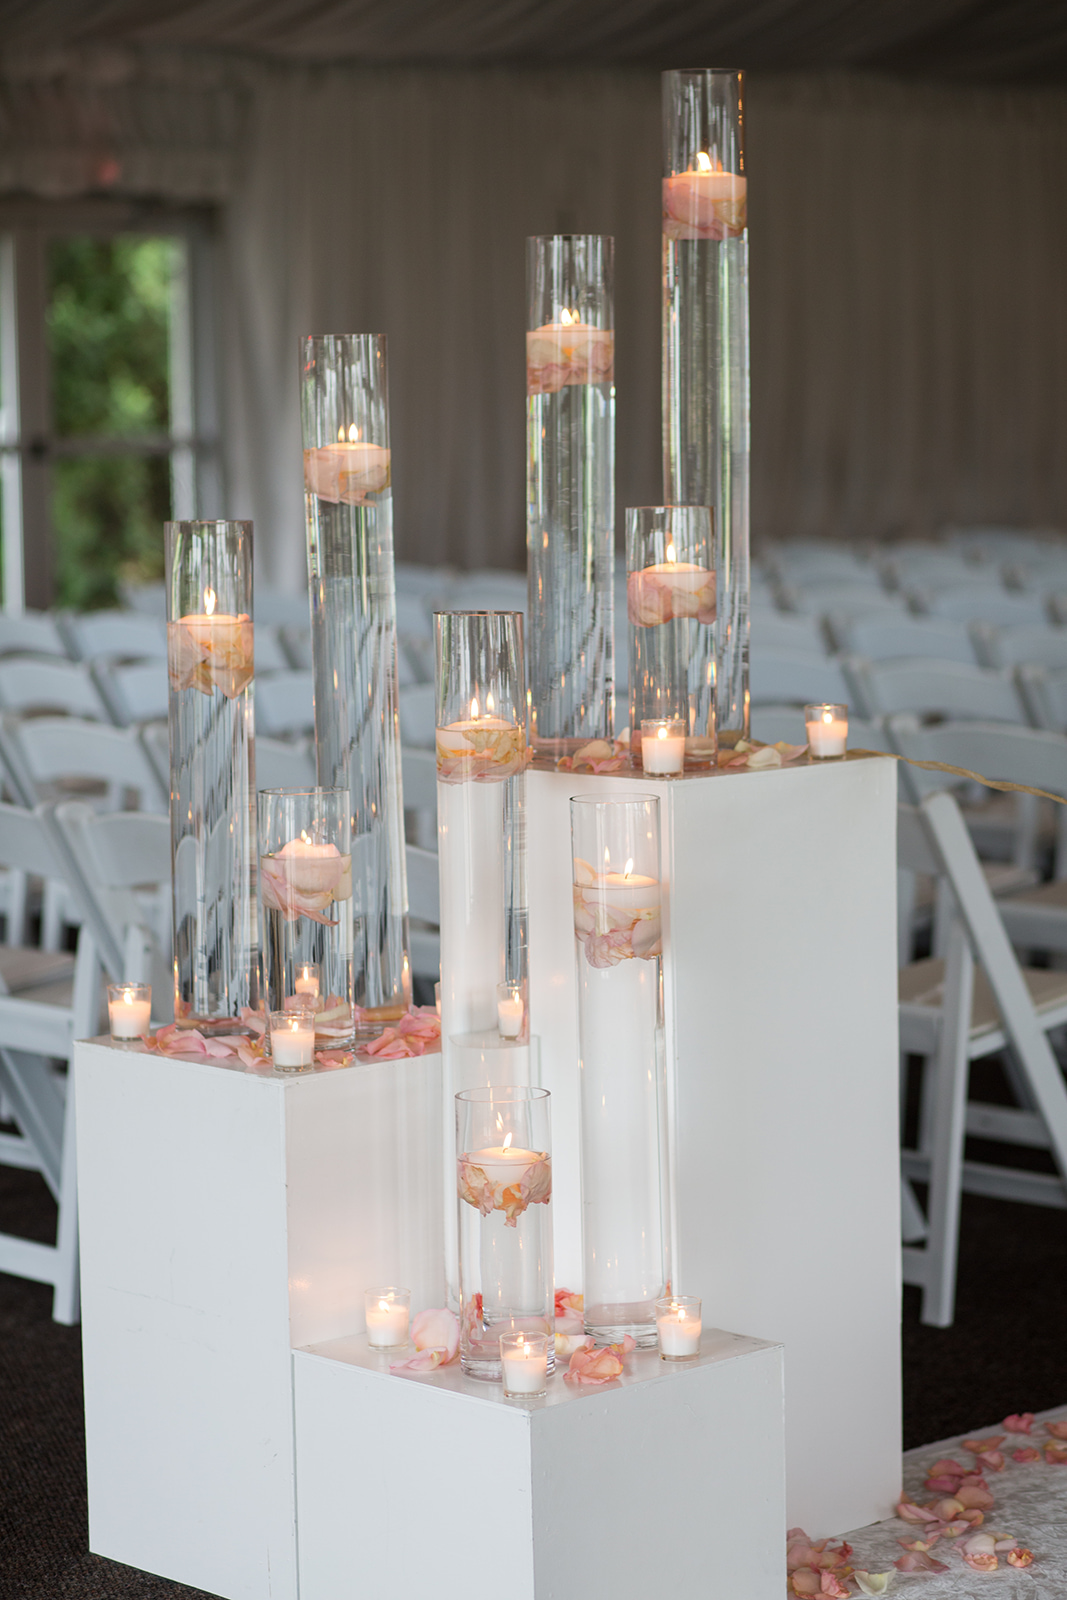 Le Cape Weddings - Sumeet and Chavi - Detalis Ceremony --4.jpg